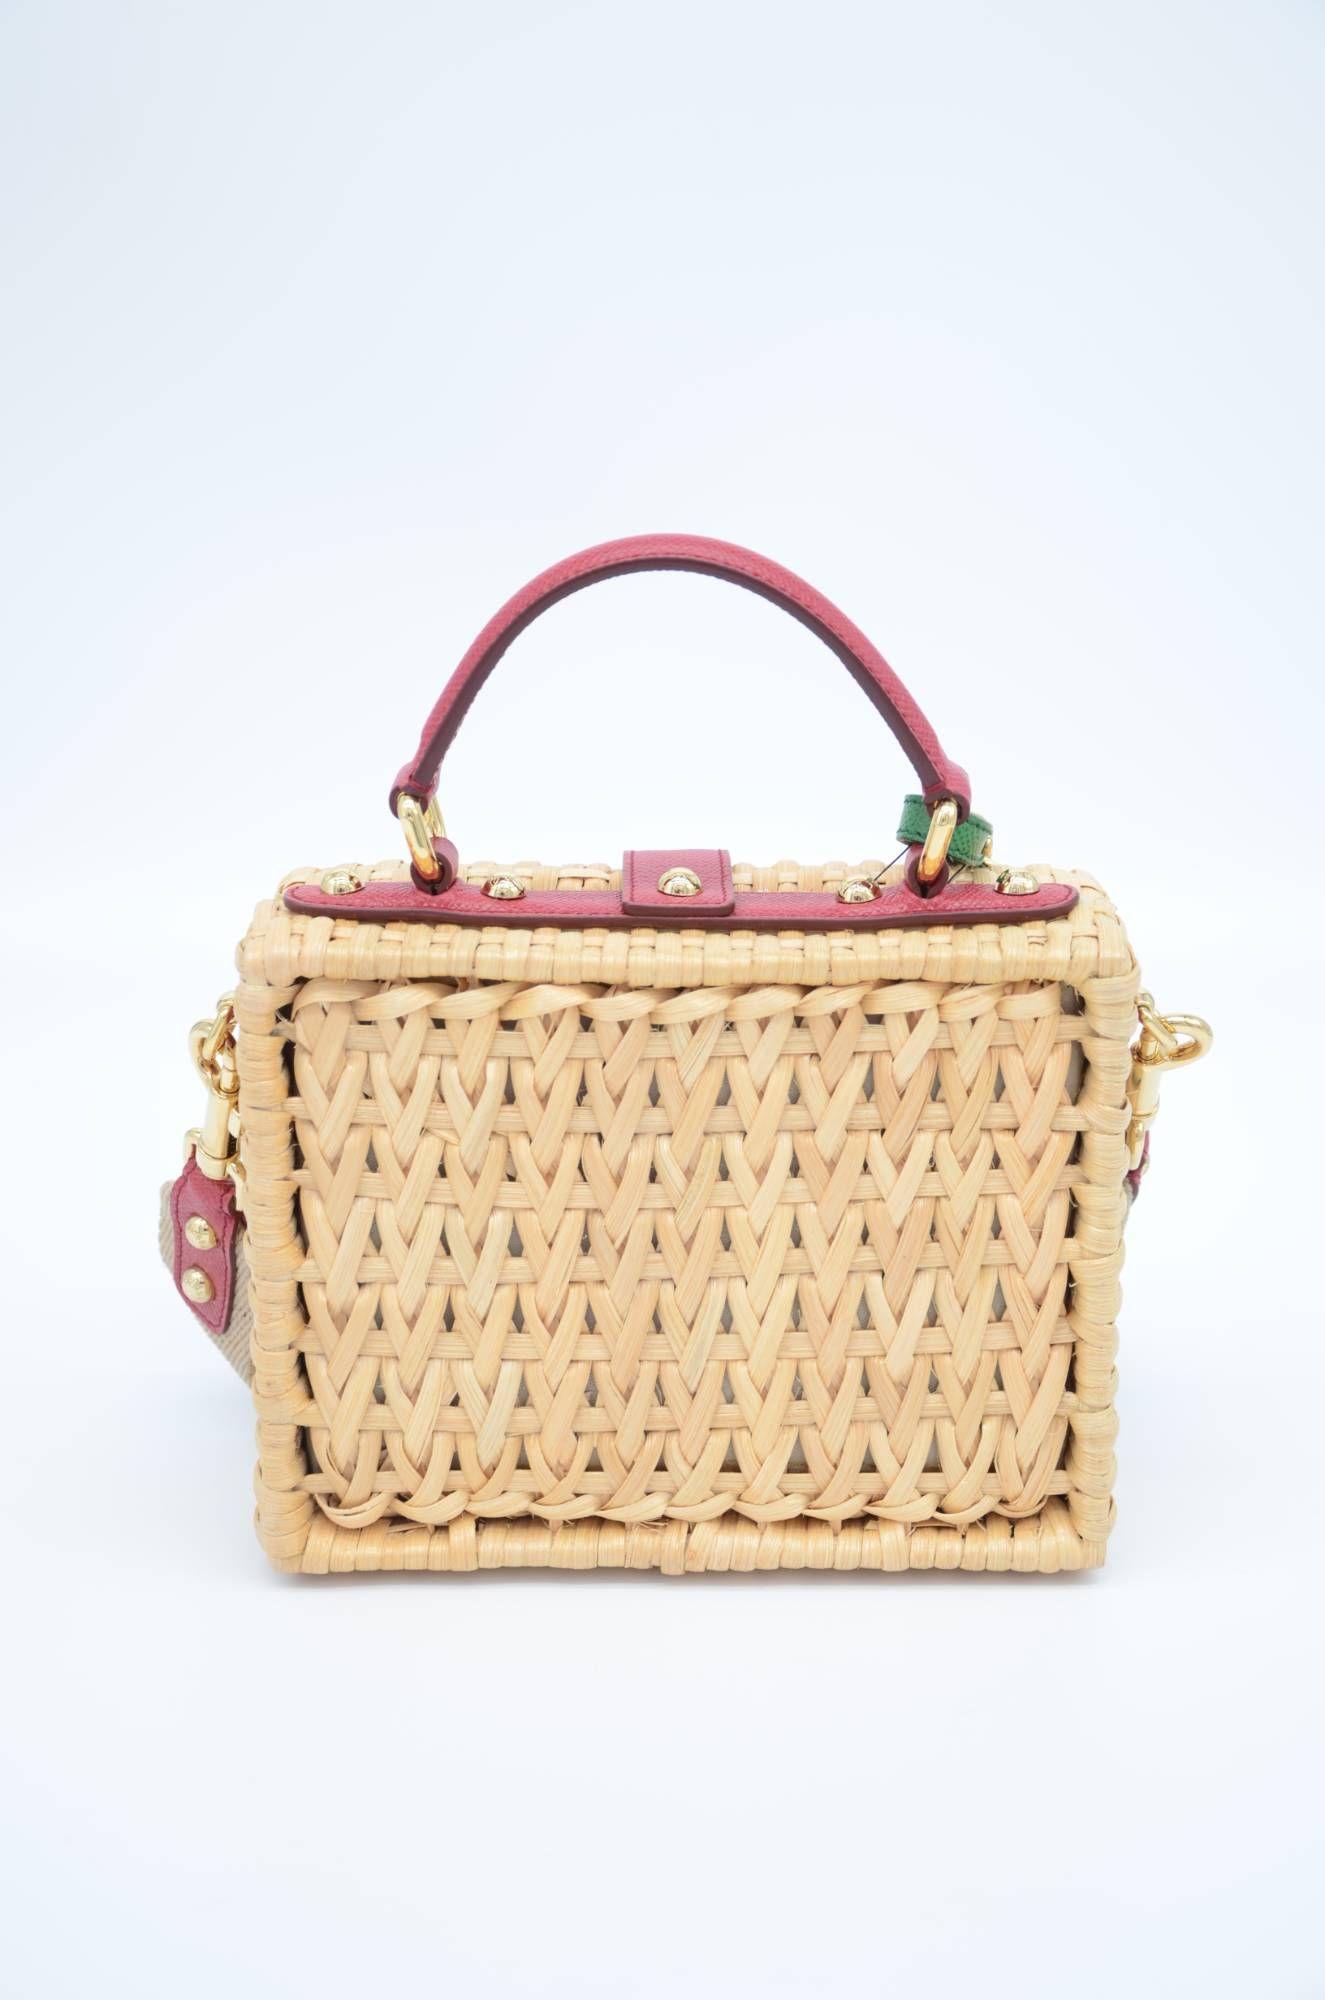 Dolce & Gabbana Women Leather Clutch Bag